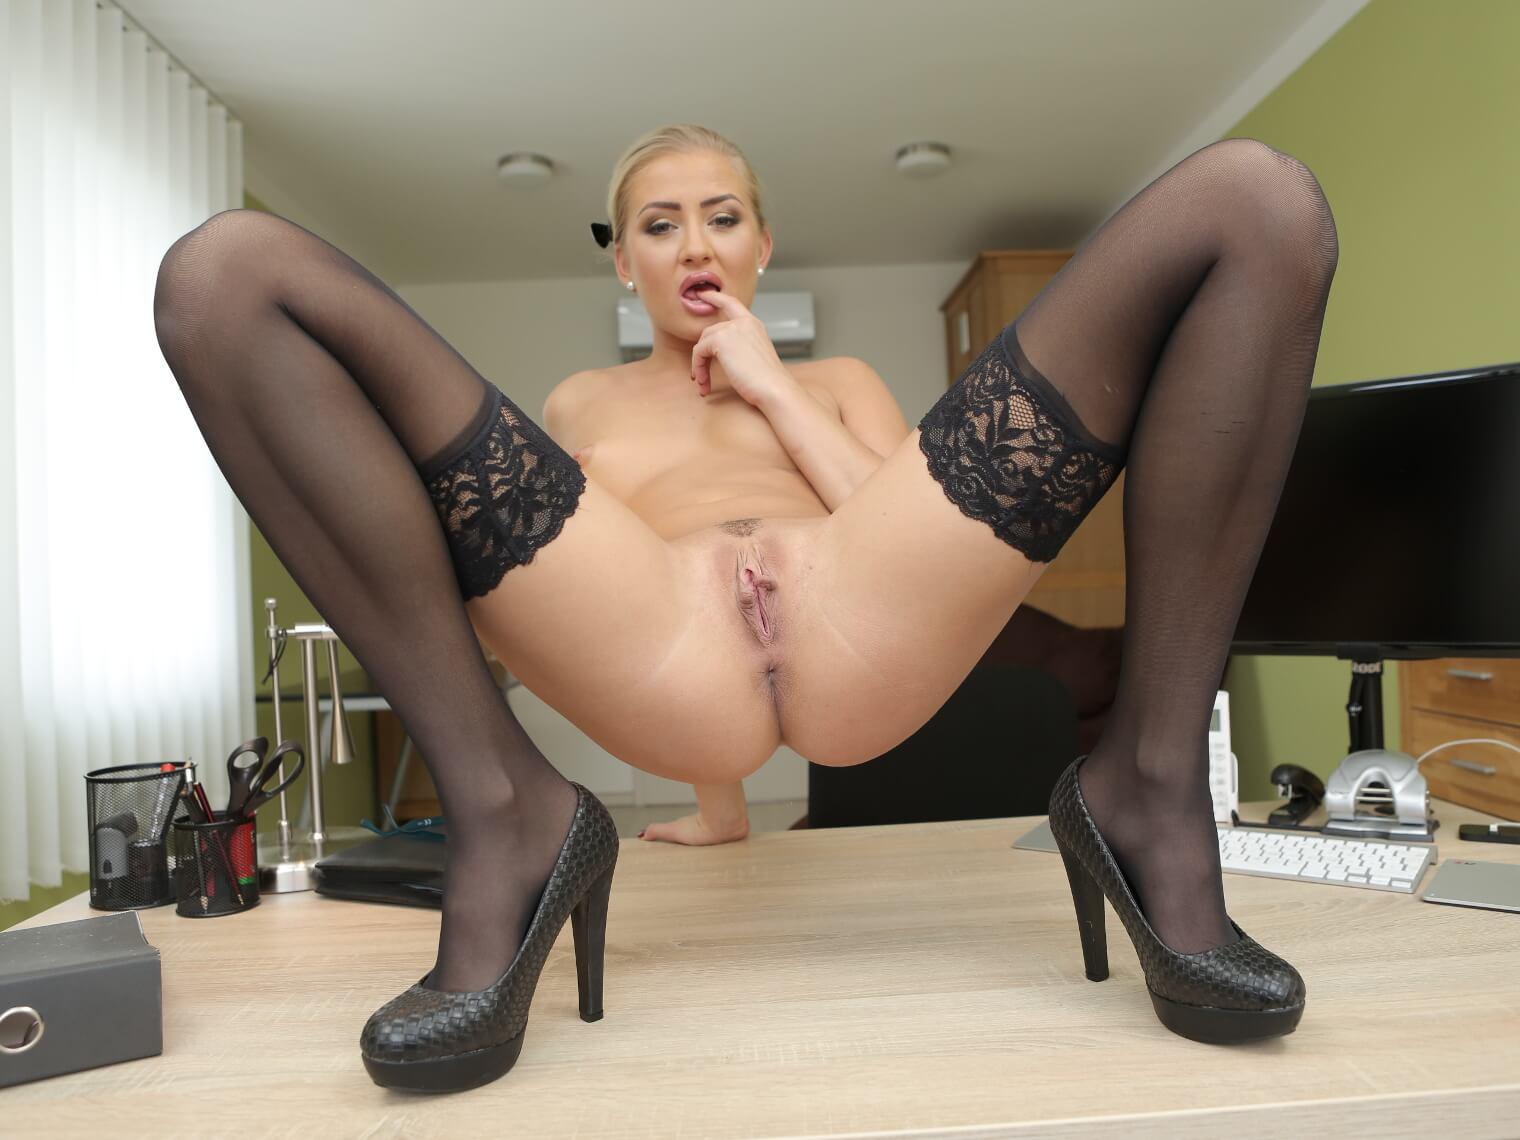 The Horny Secretary VR Porn